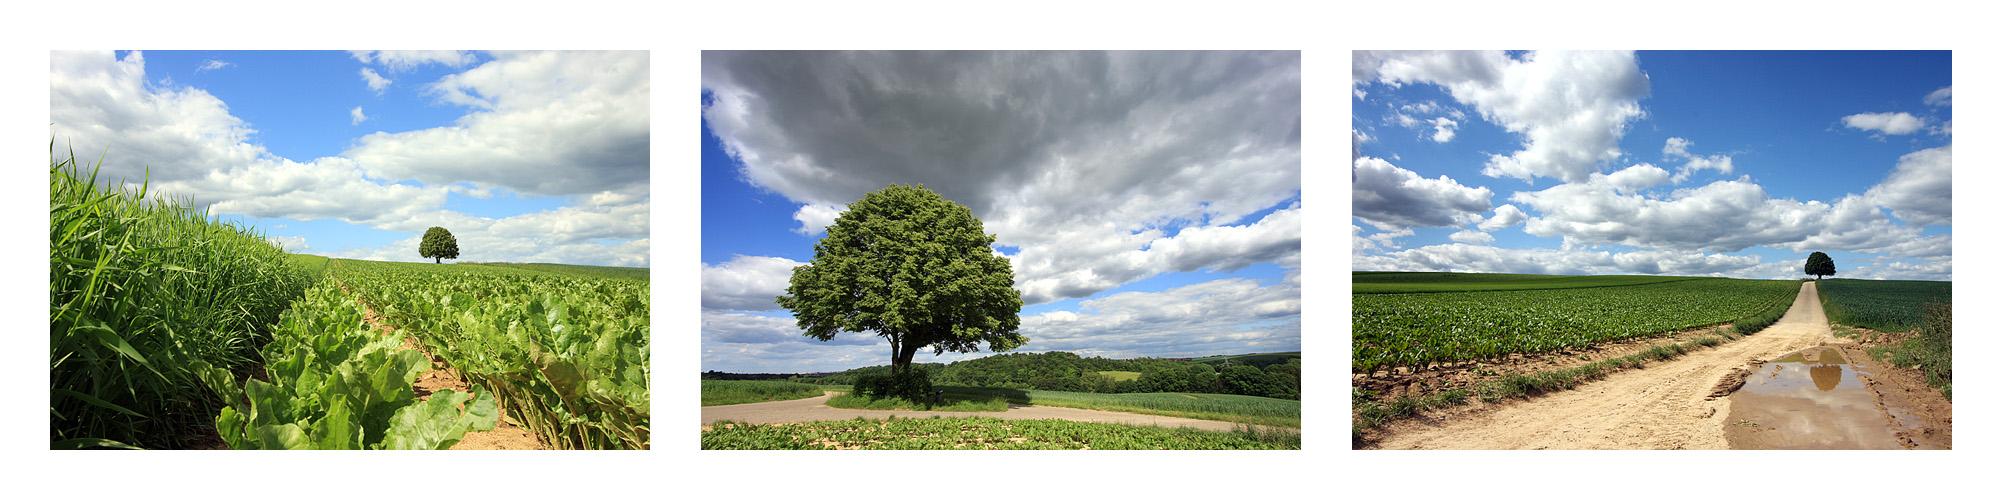 One tree - three views